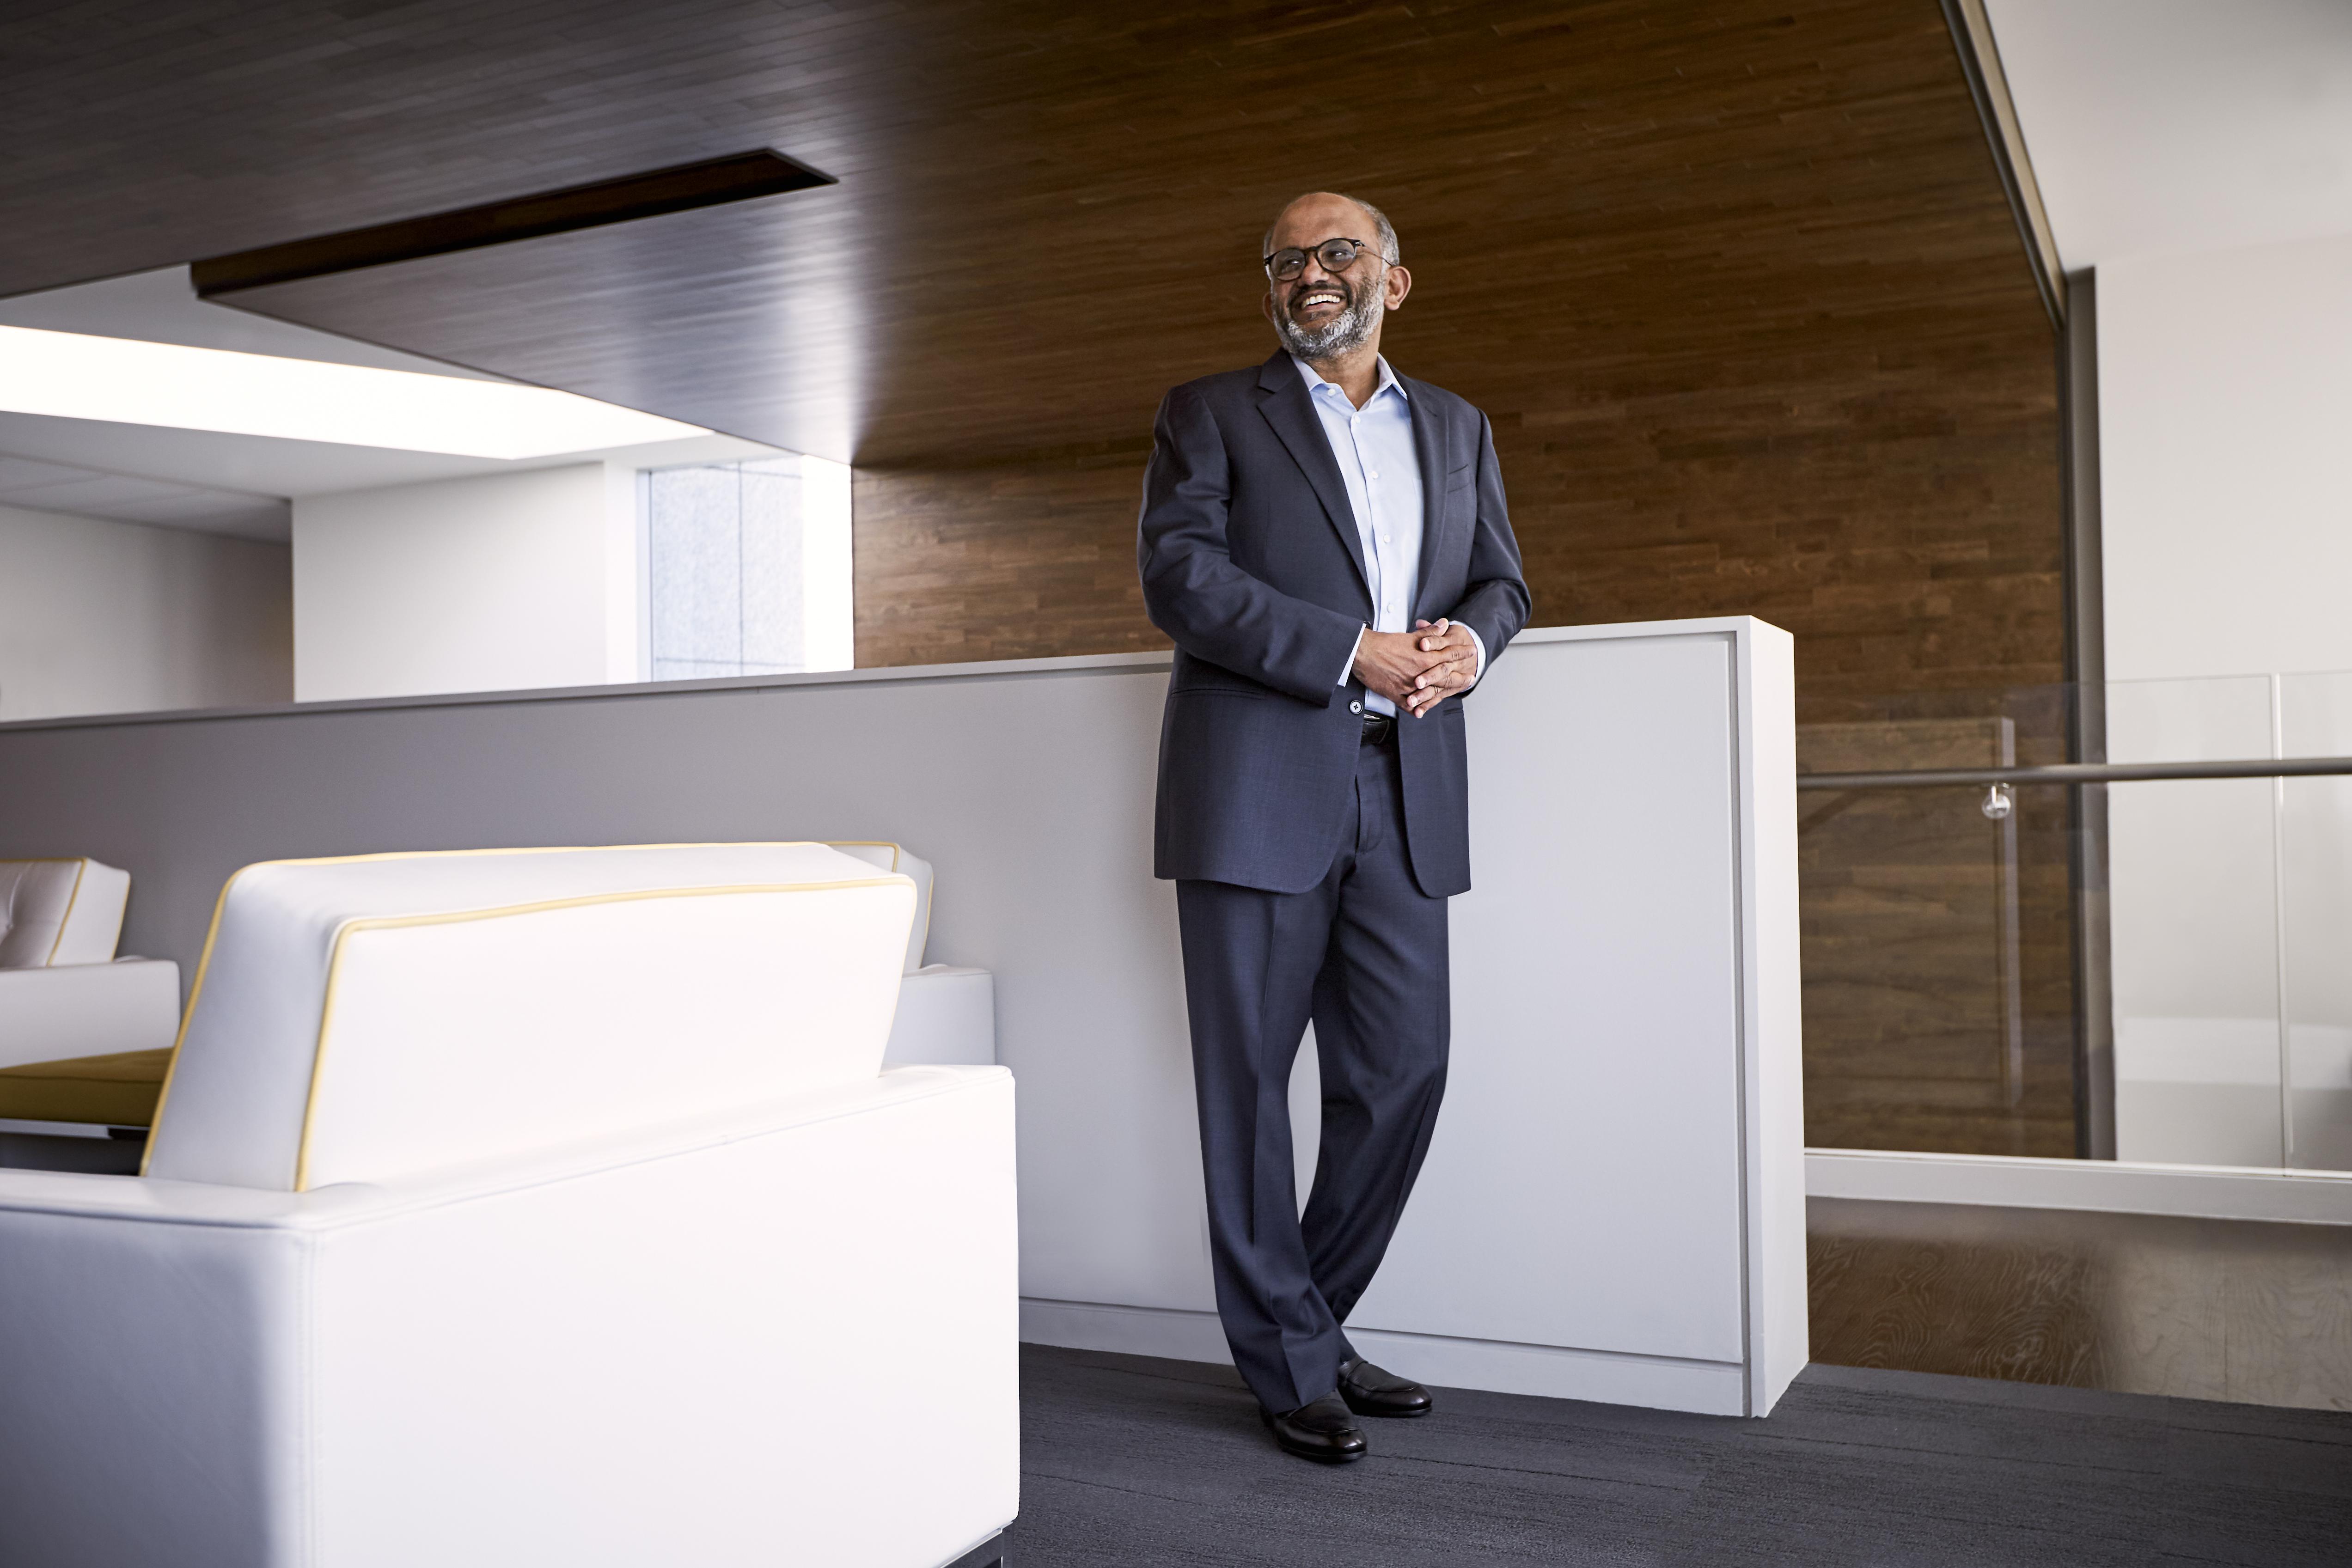 A smiling Adobe CEO Shantanu Narayen standing next to a white counter.